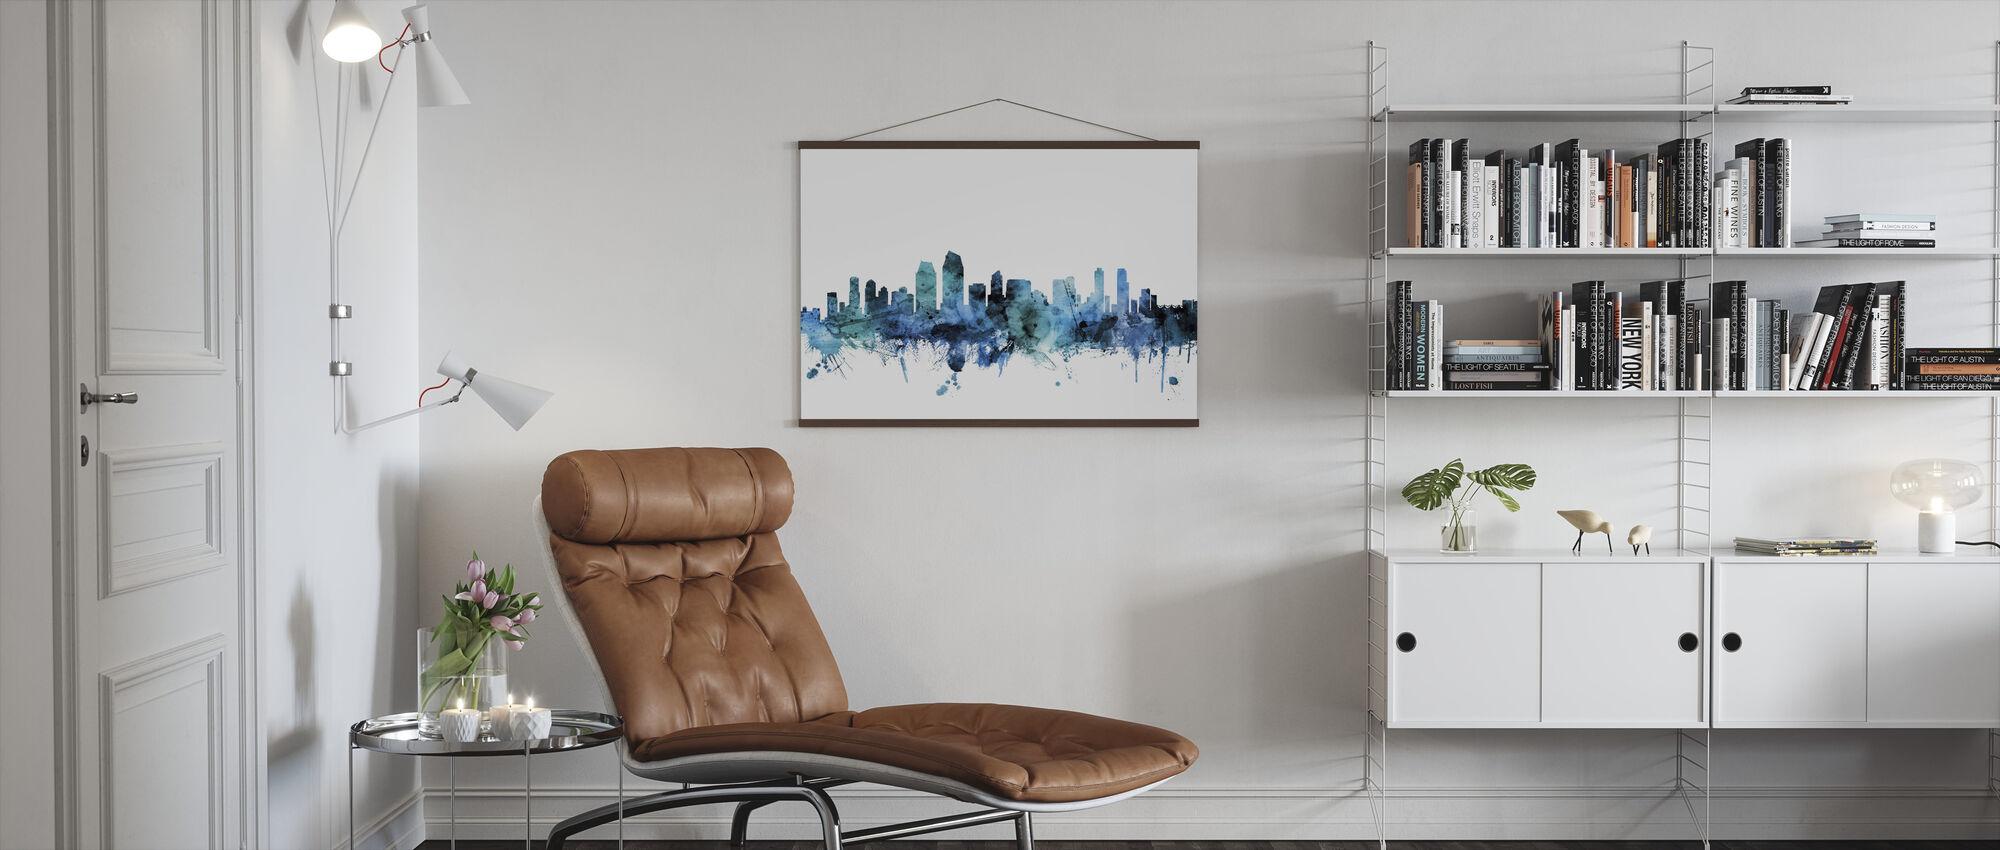 San Diego Skyline - Plakat - Stue